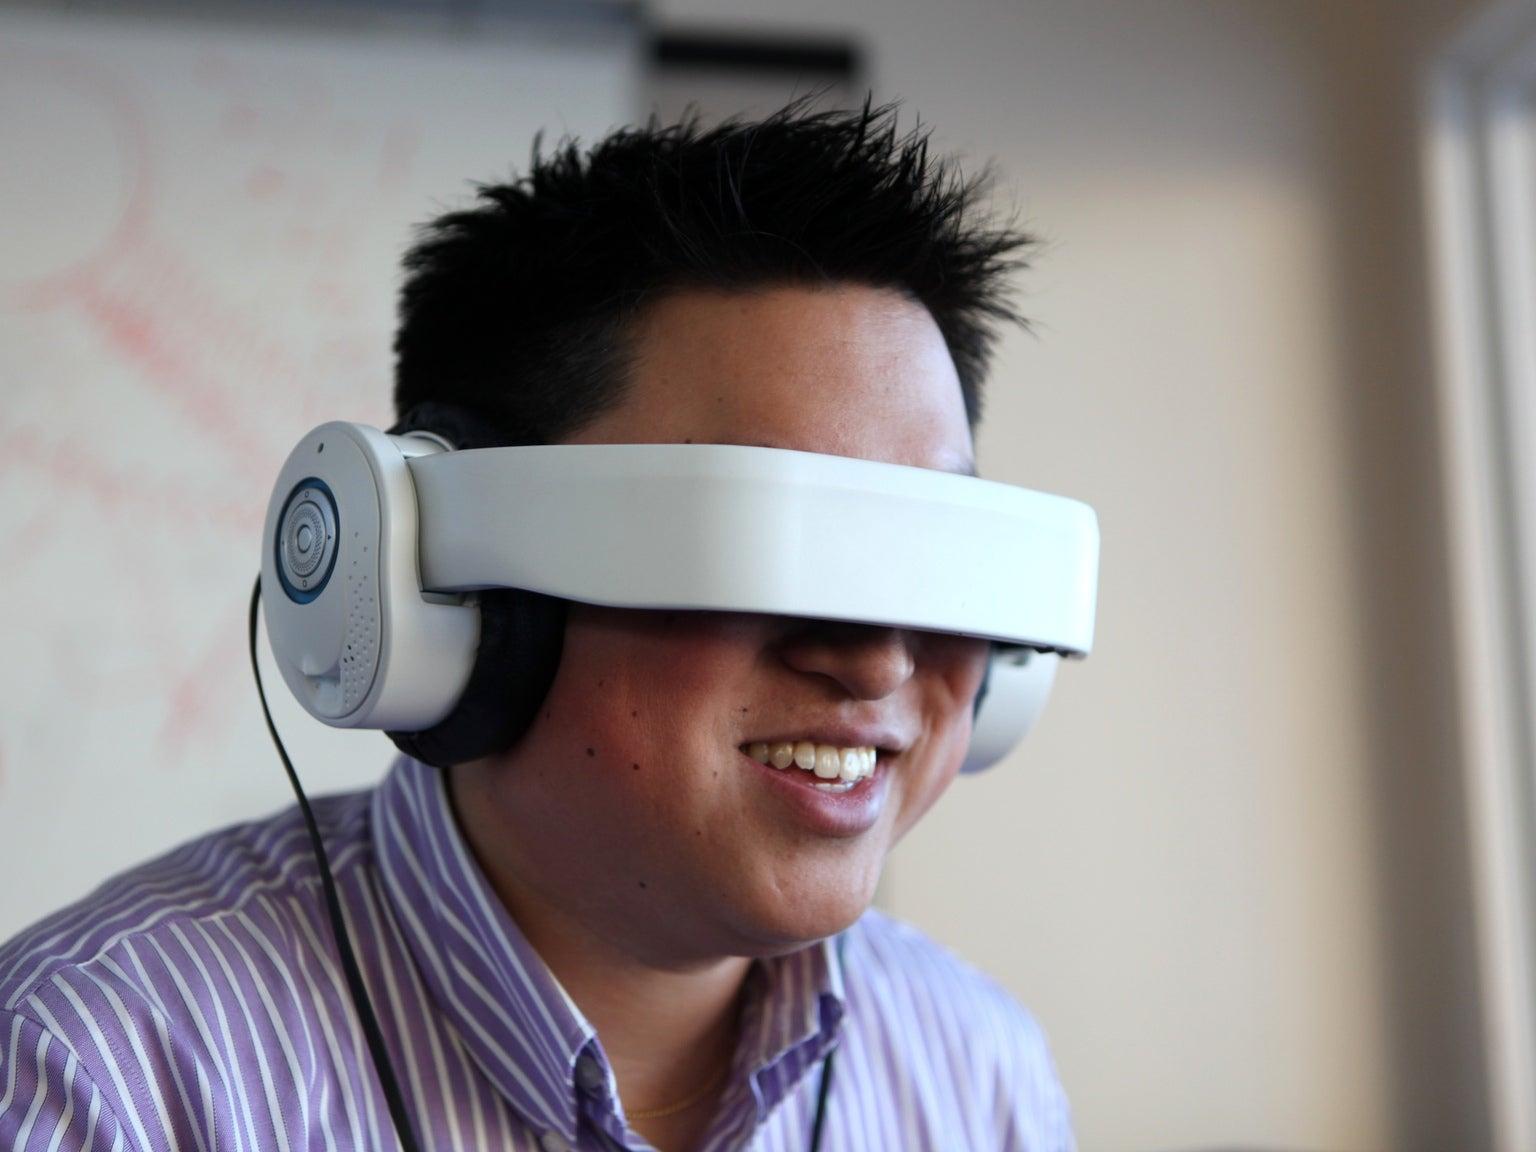 Avegant's Glyph headset